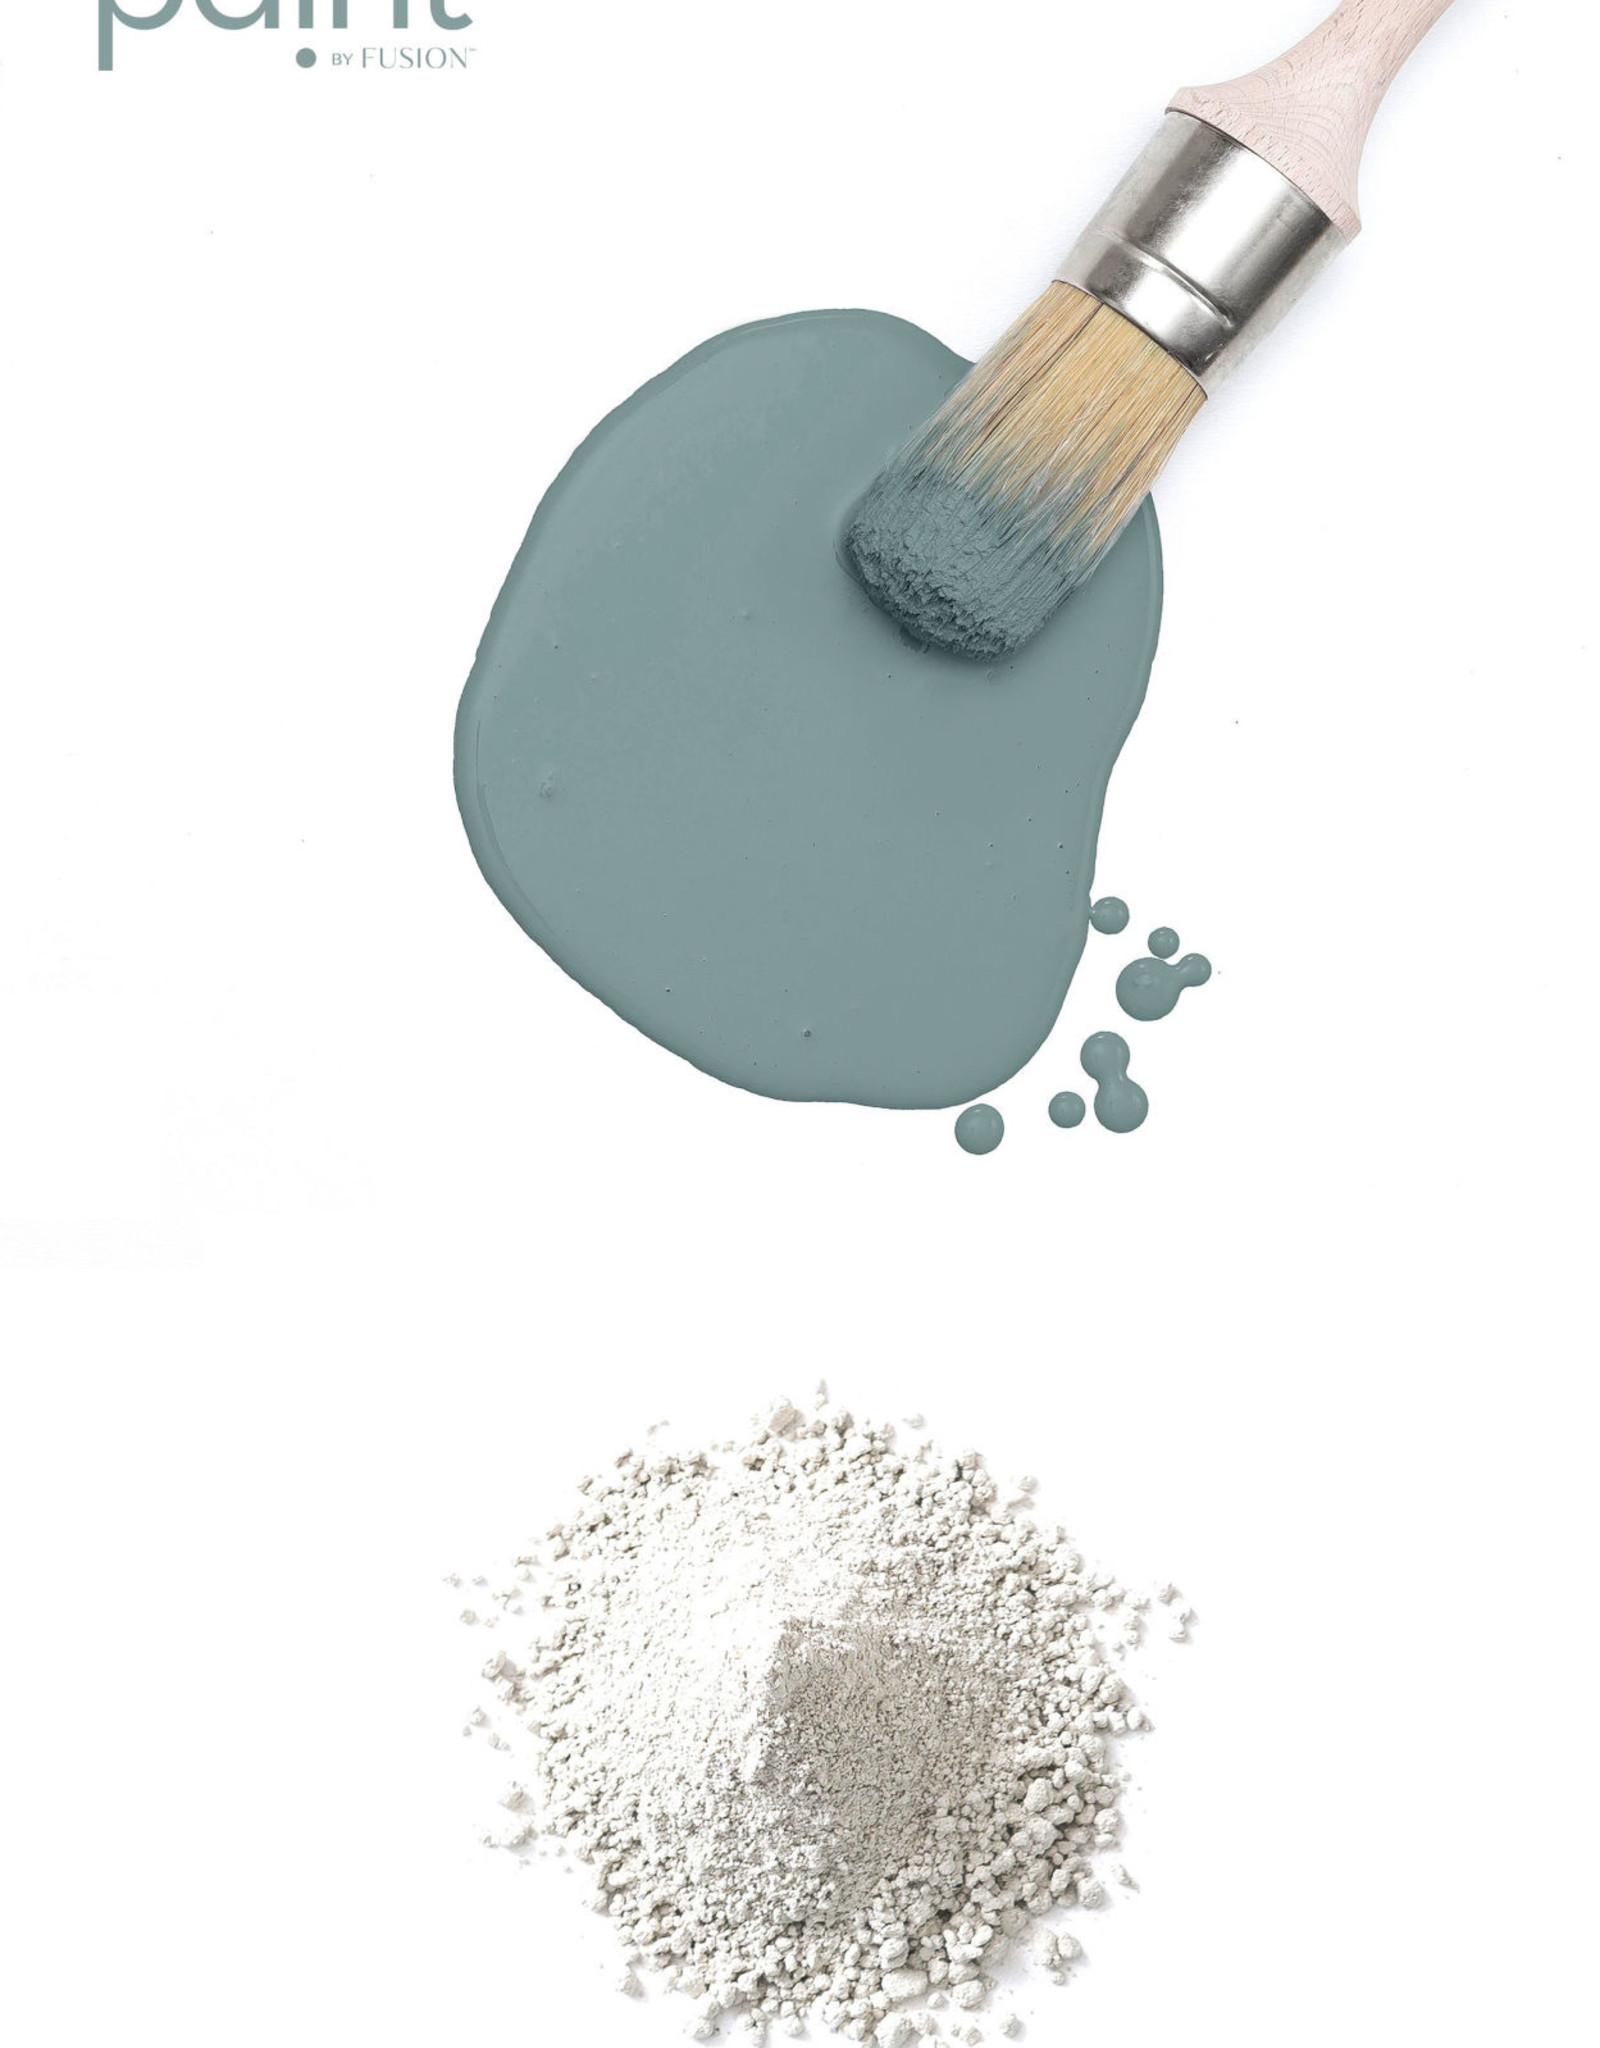 Fusion Mineral Paint Milk Paint 330g Sea Glass